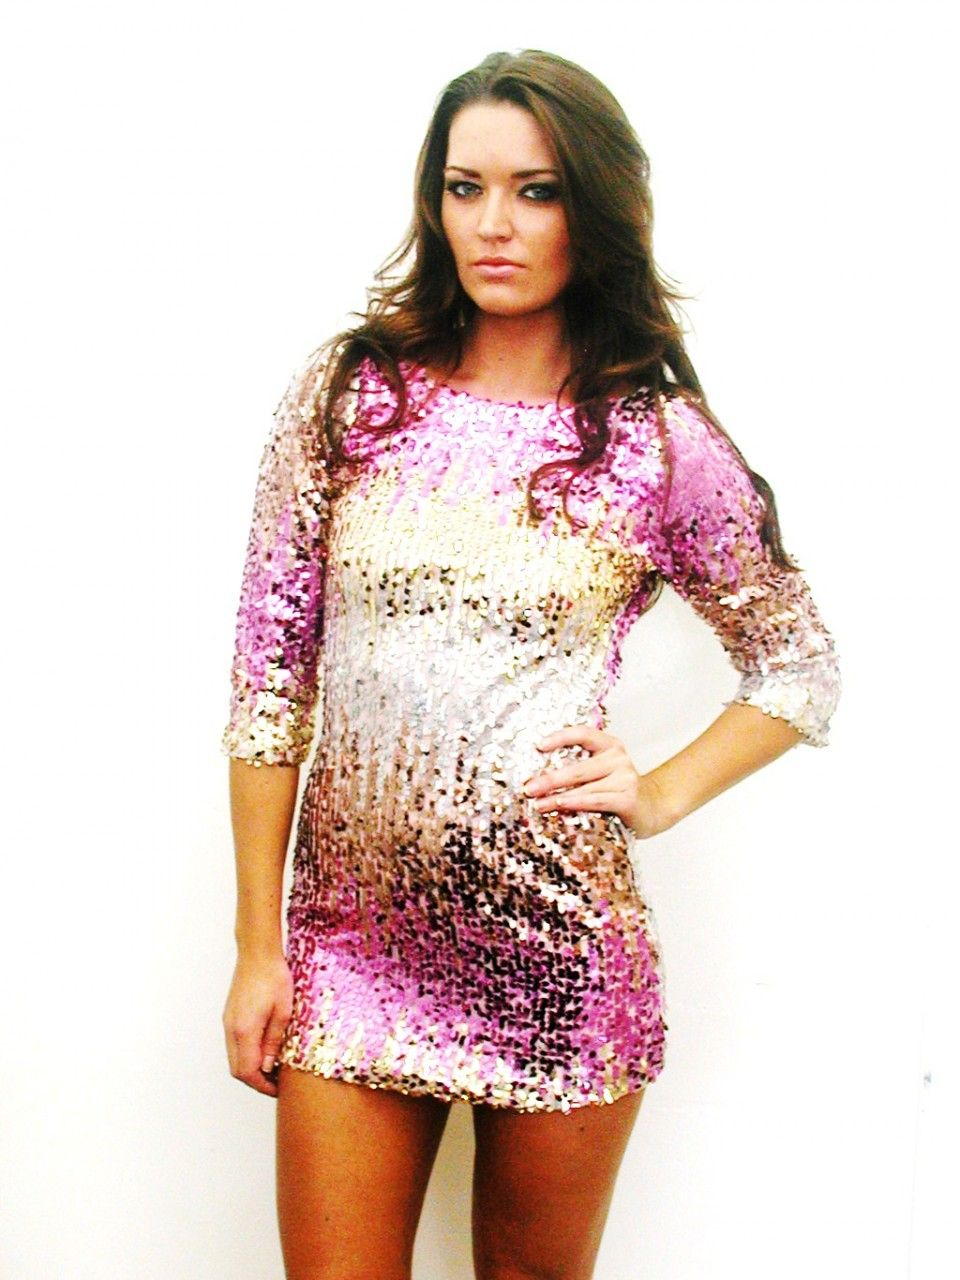 shop kami shade' - plus size diva pink, gold sequin dress | plus